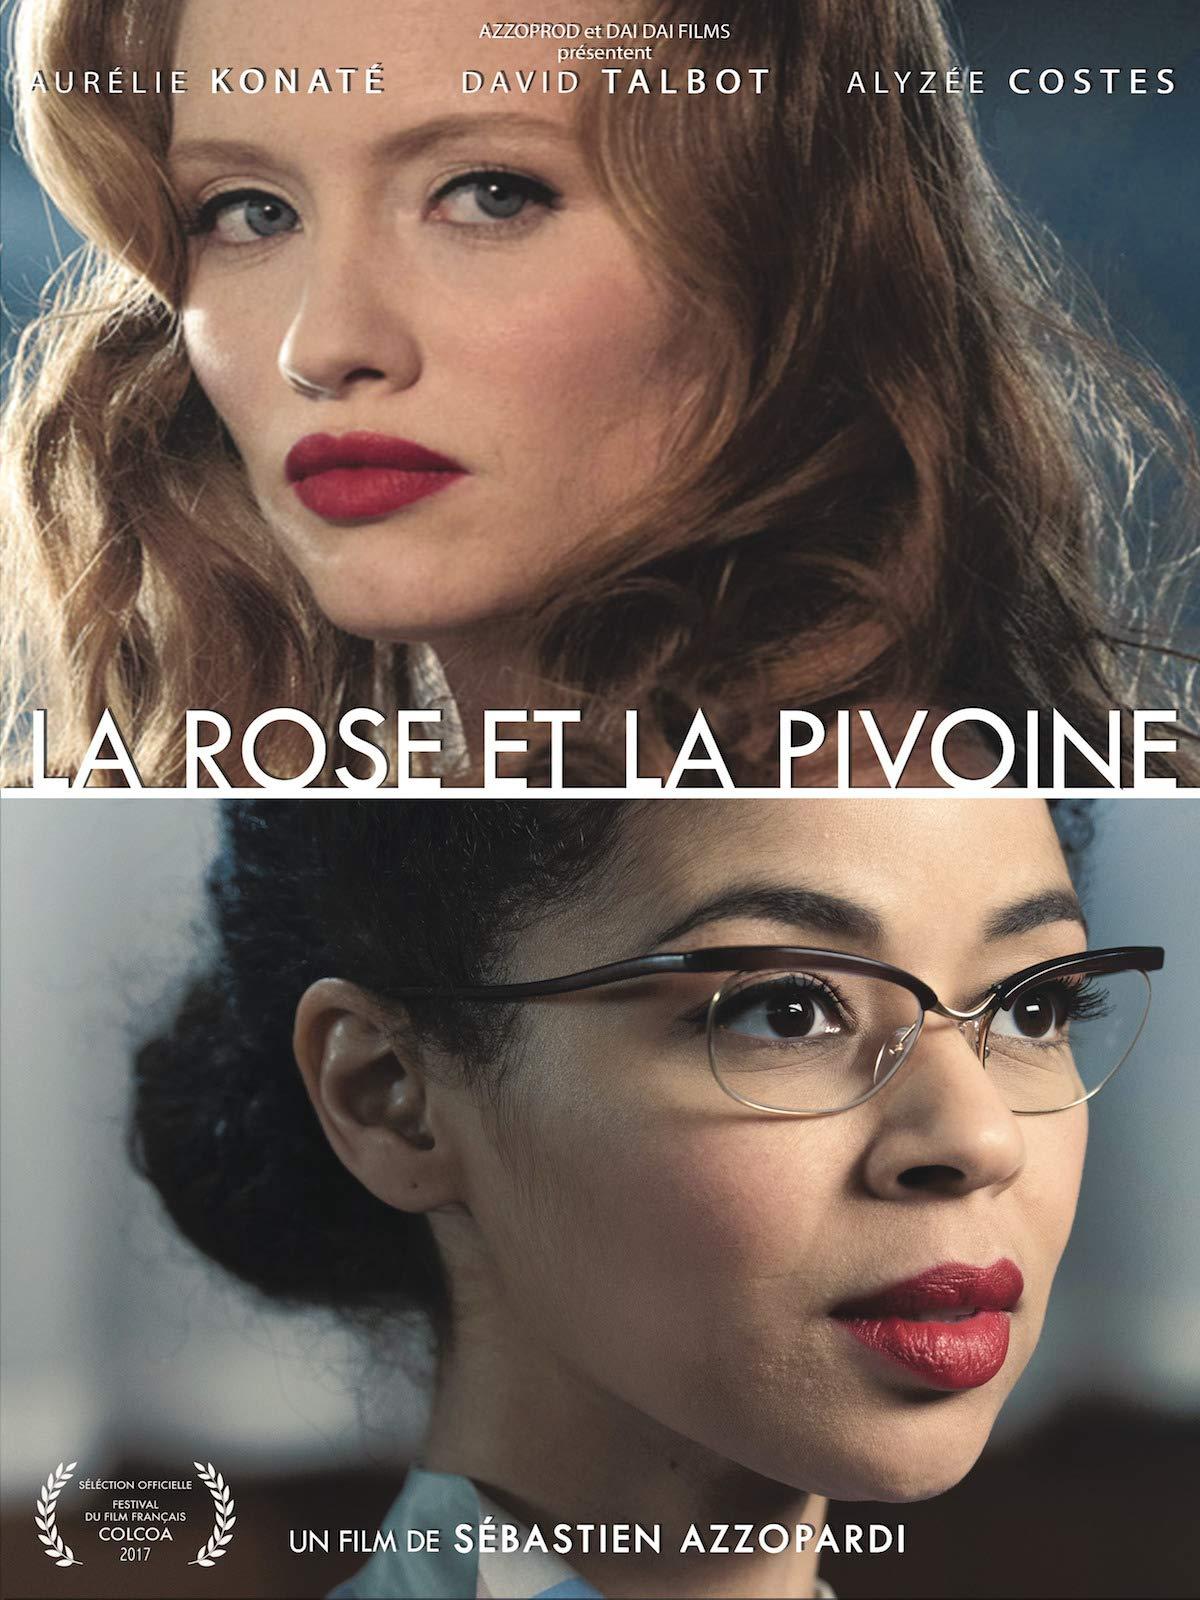 Rose & Peony, A War of Flowers (La Rose et la Pivoine) on Amazon Prime Video UK